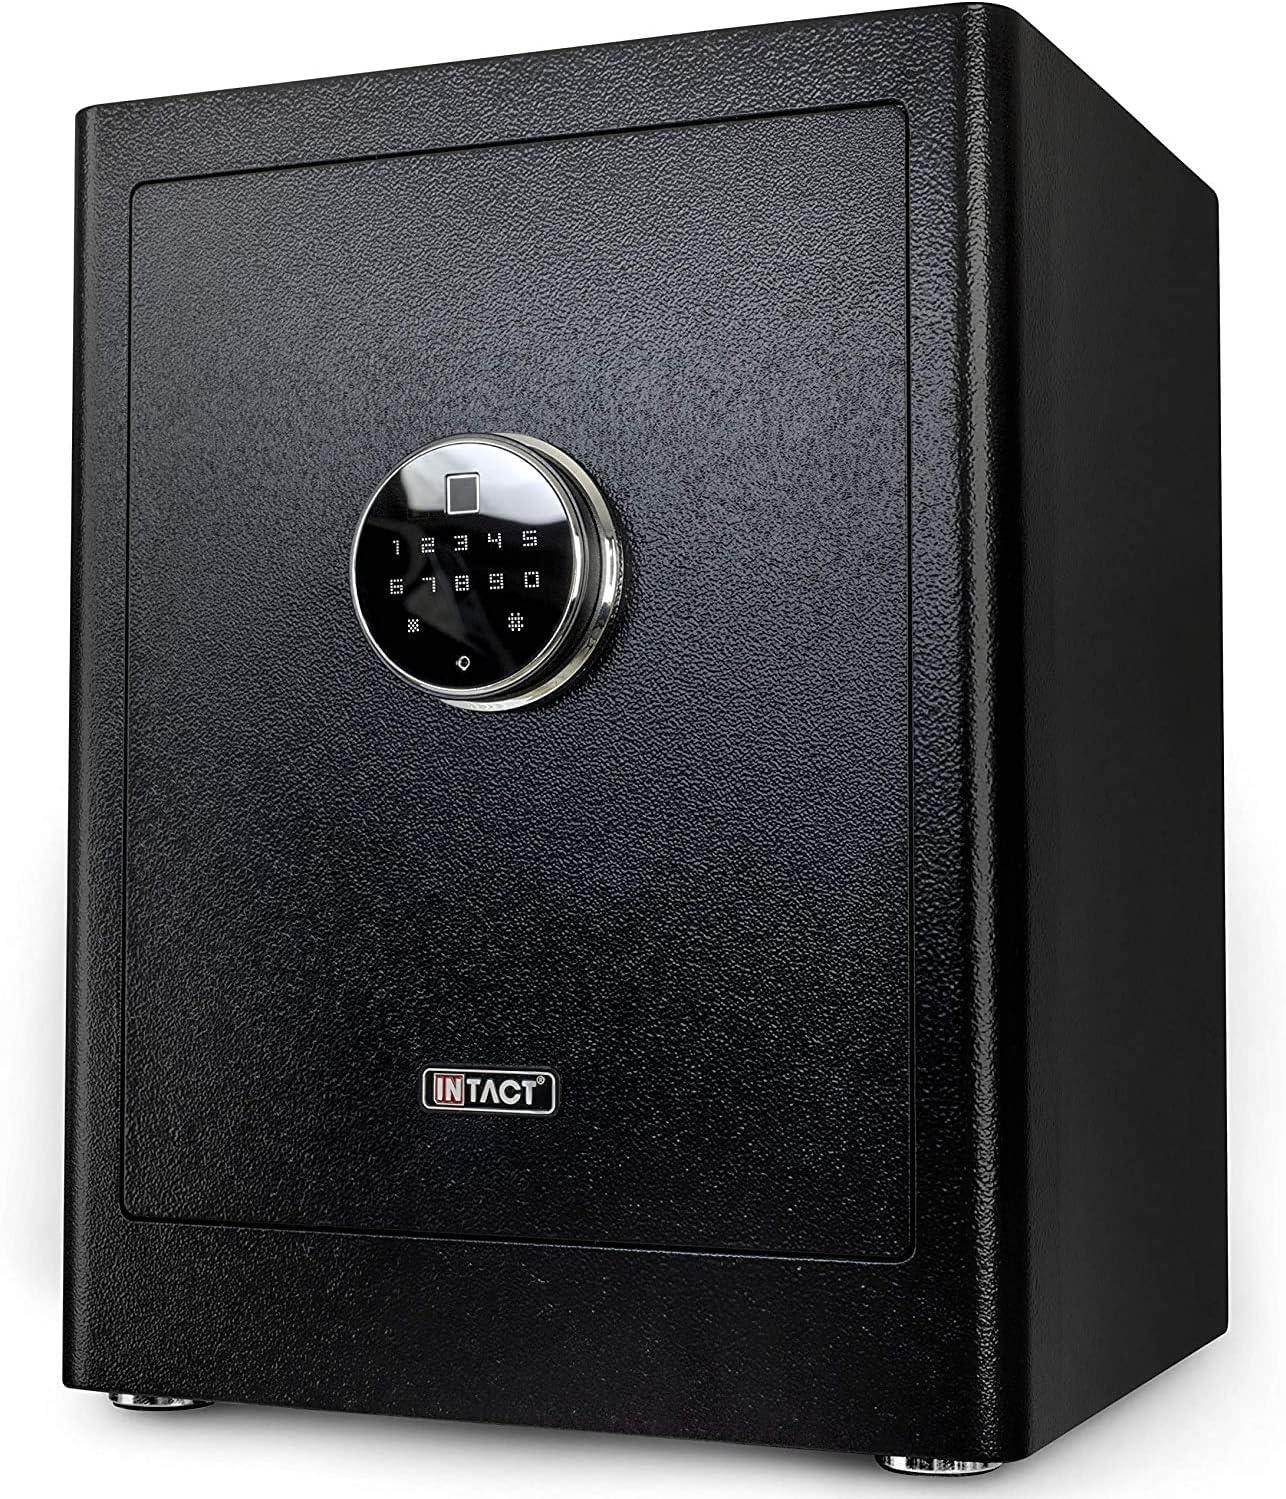 Intact Large Quick Access Biometric 開催中 Fingerprint Safe Ne 40%OFFの激安セール With Gun